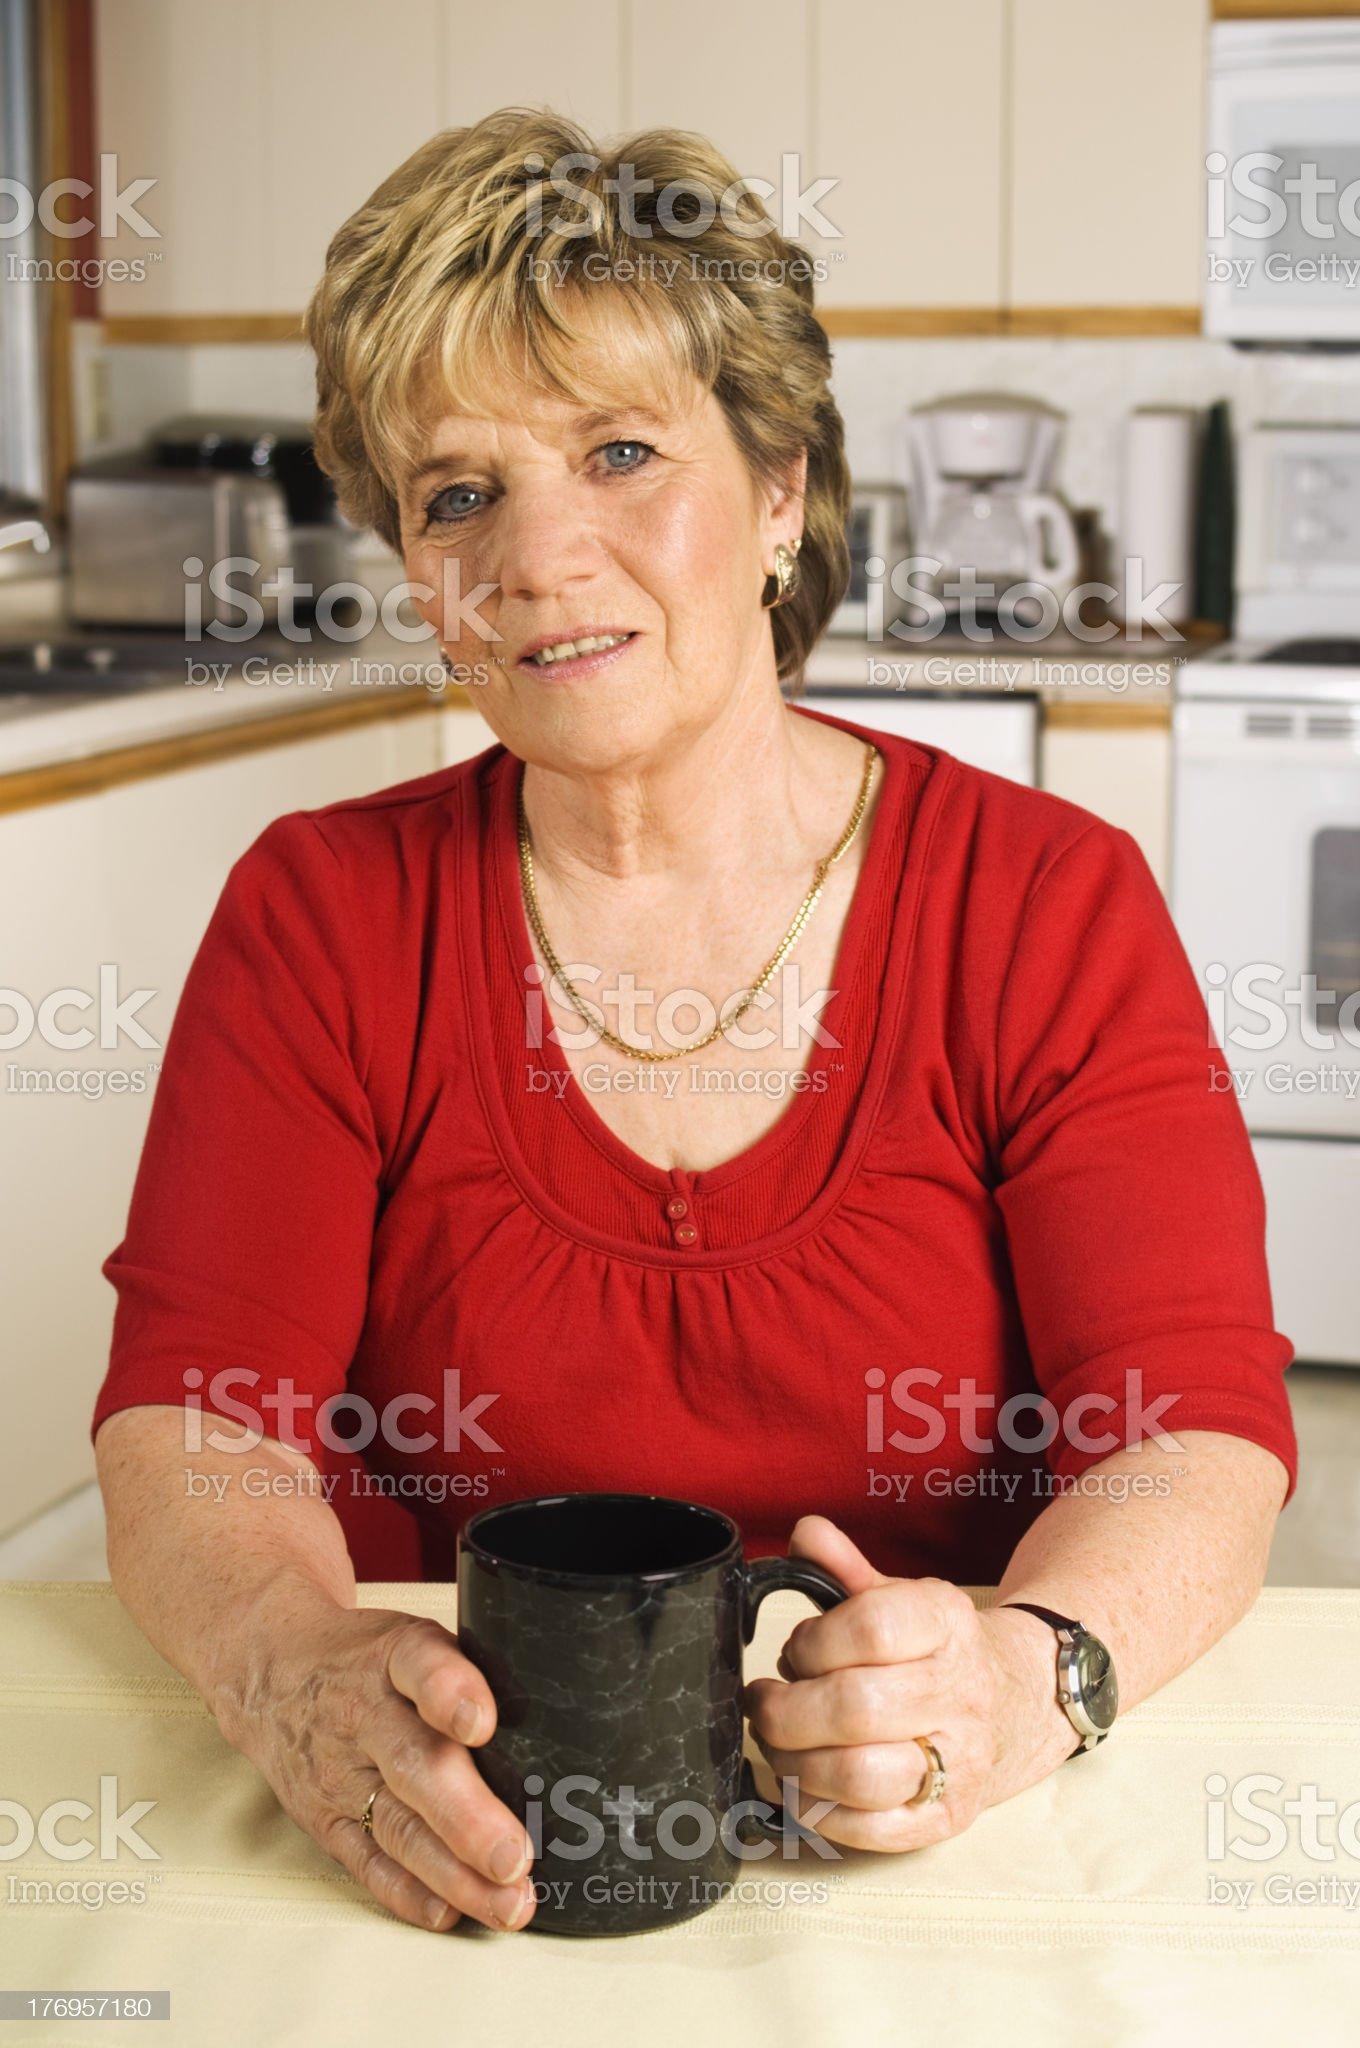 Senior woman taking a coffee break in her kitchen royalty-free stock photo